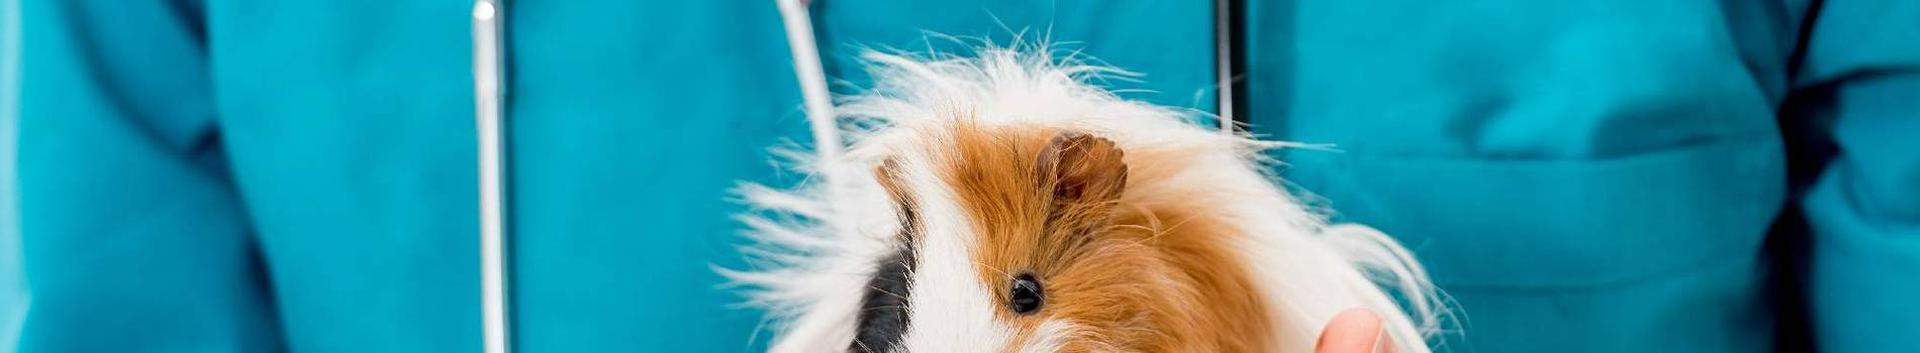 75001_veterinaaria_18438445_xl.jpg